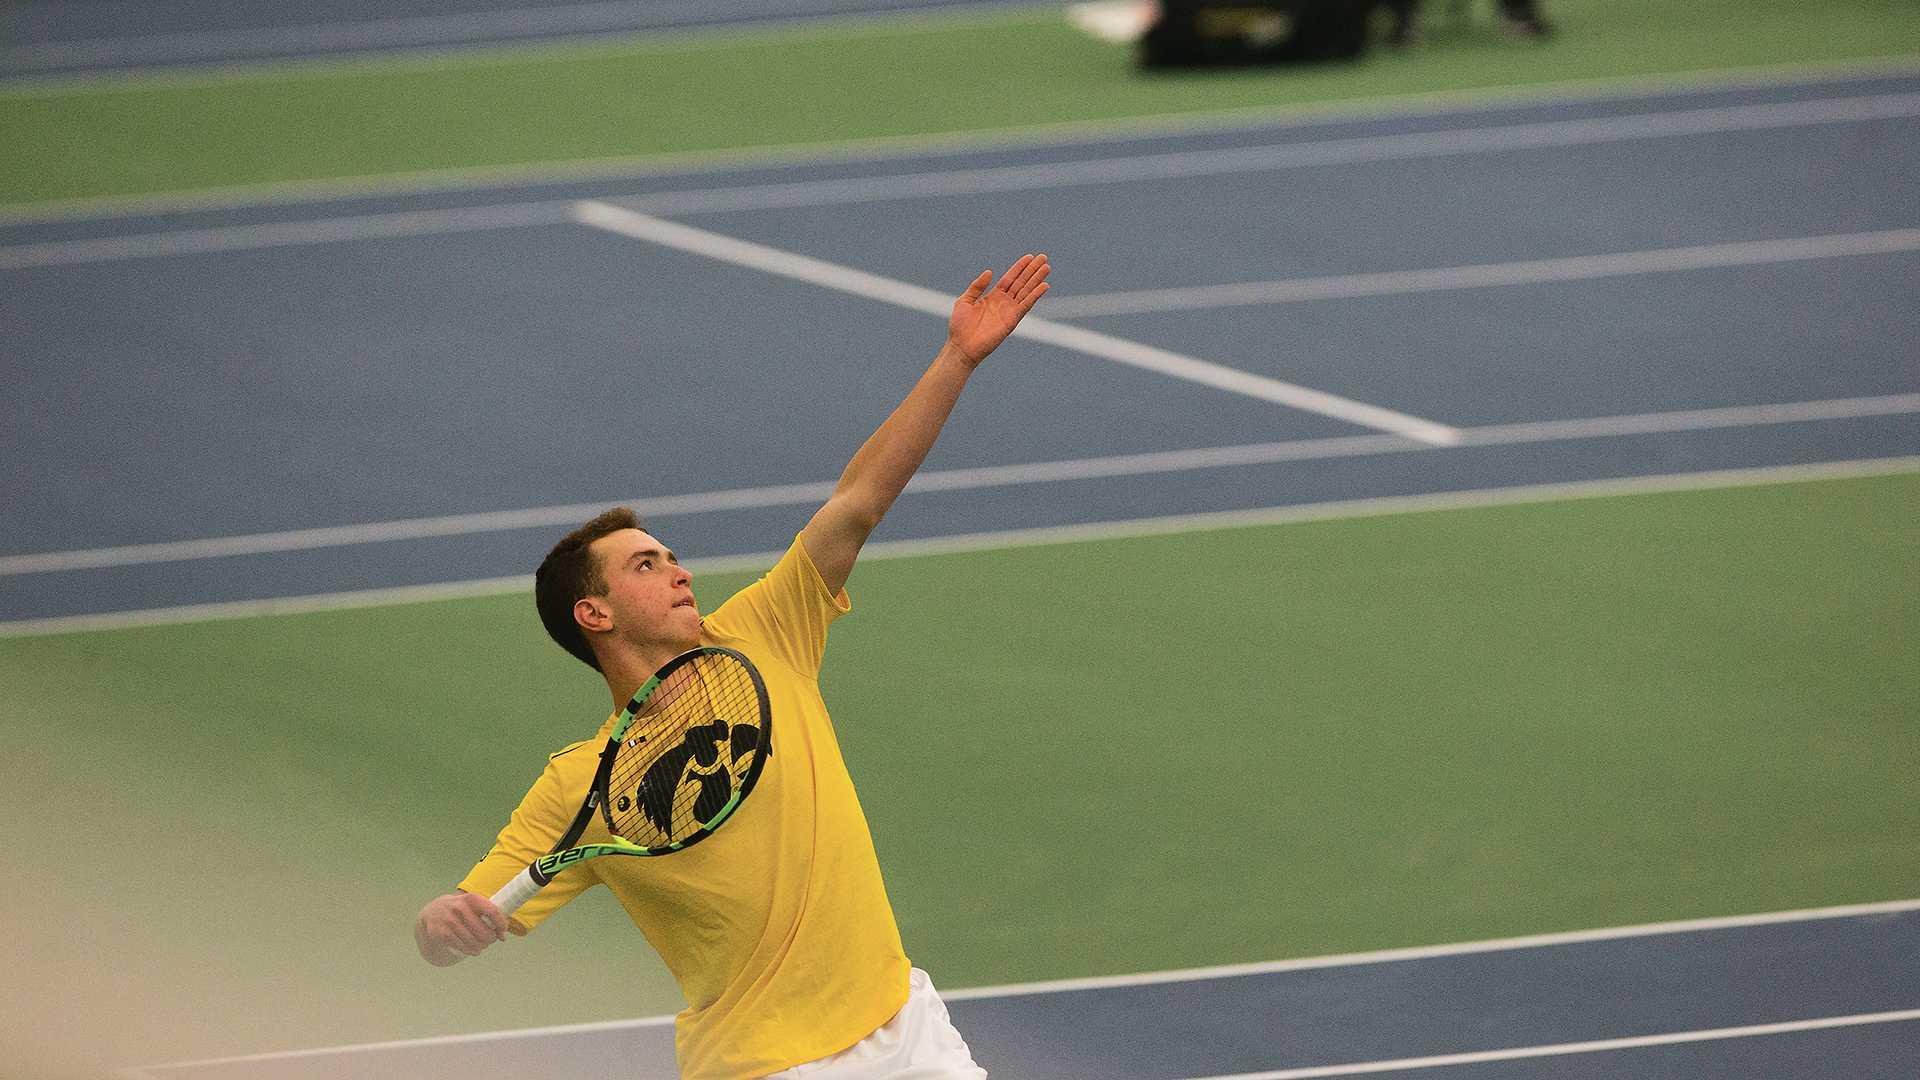 Hawkeye tennis poised for improvement